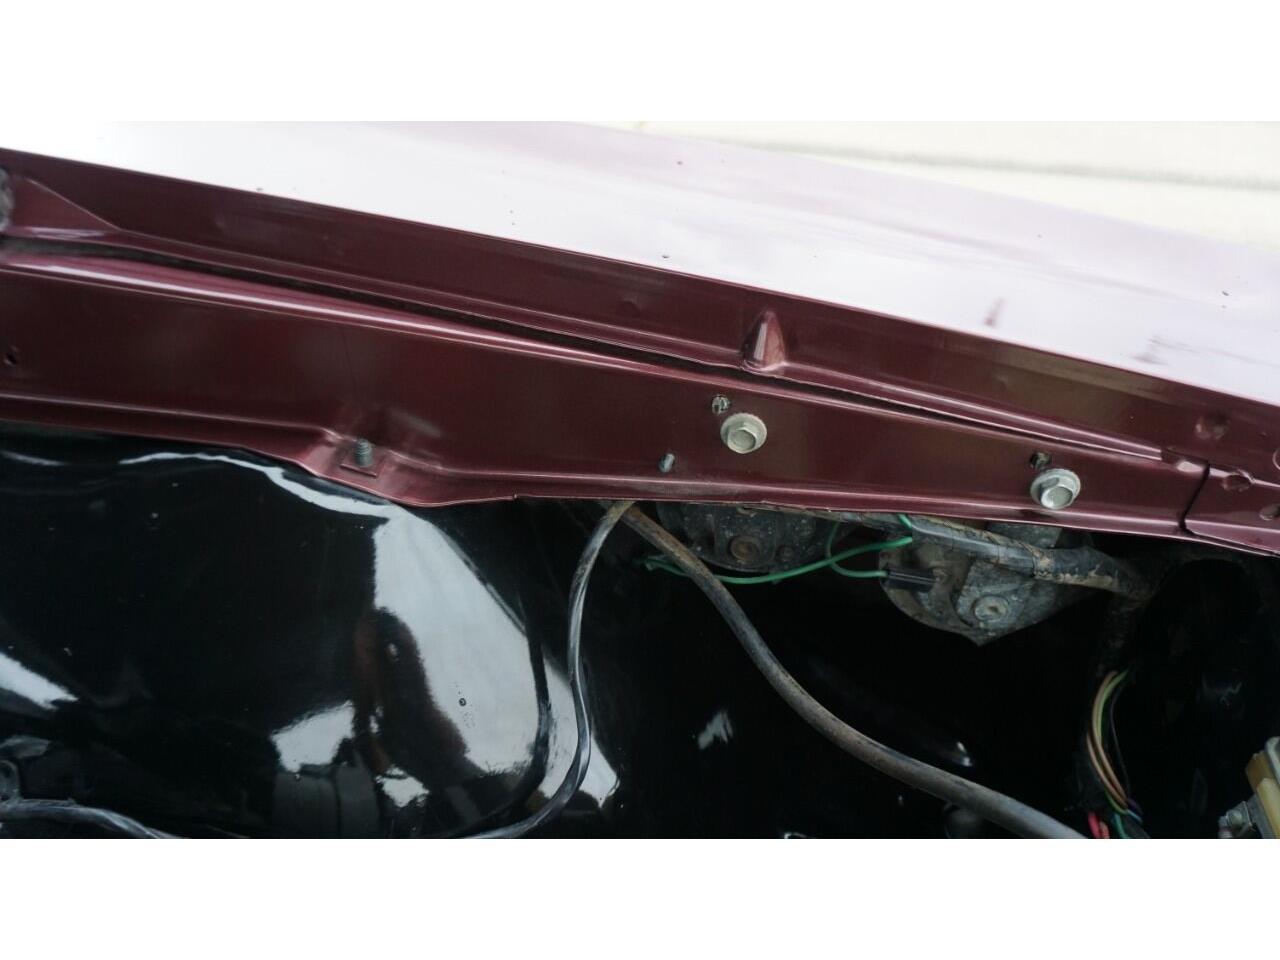 1967 Chevrolet El Camino (CC-1416345) for sale in Clarence, Iowa